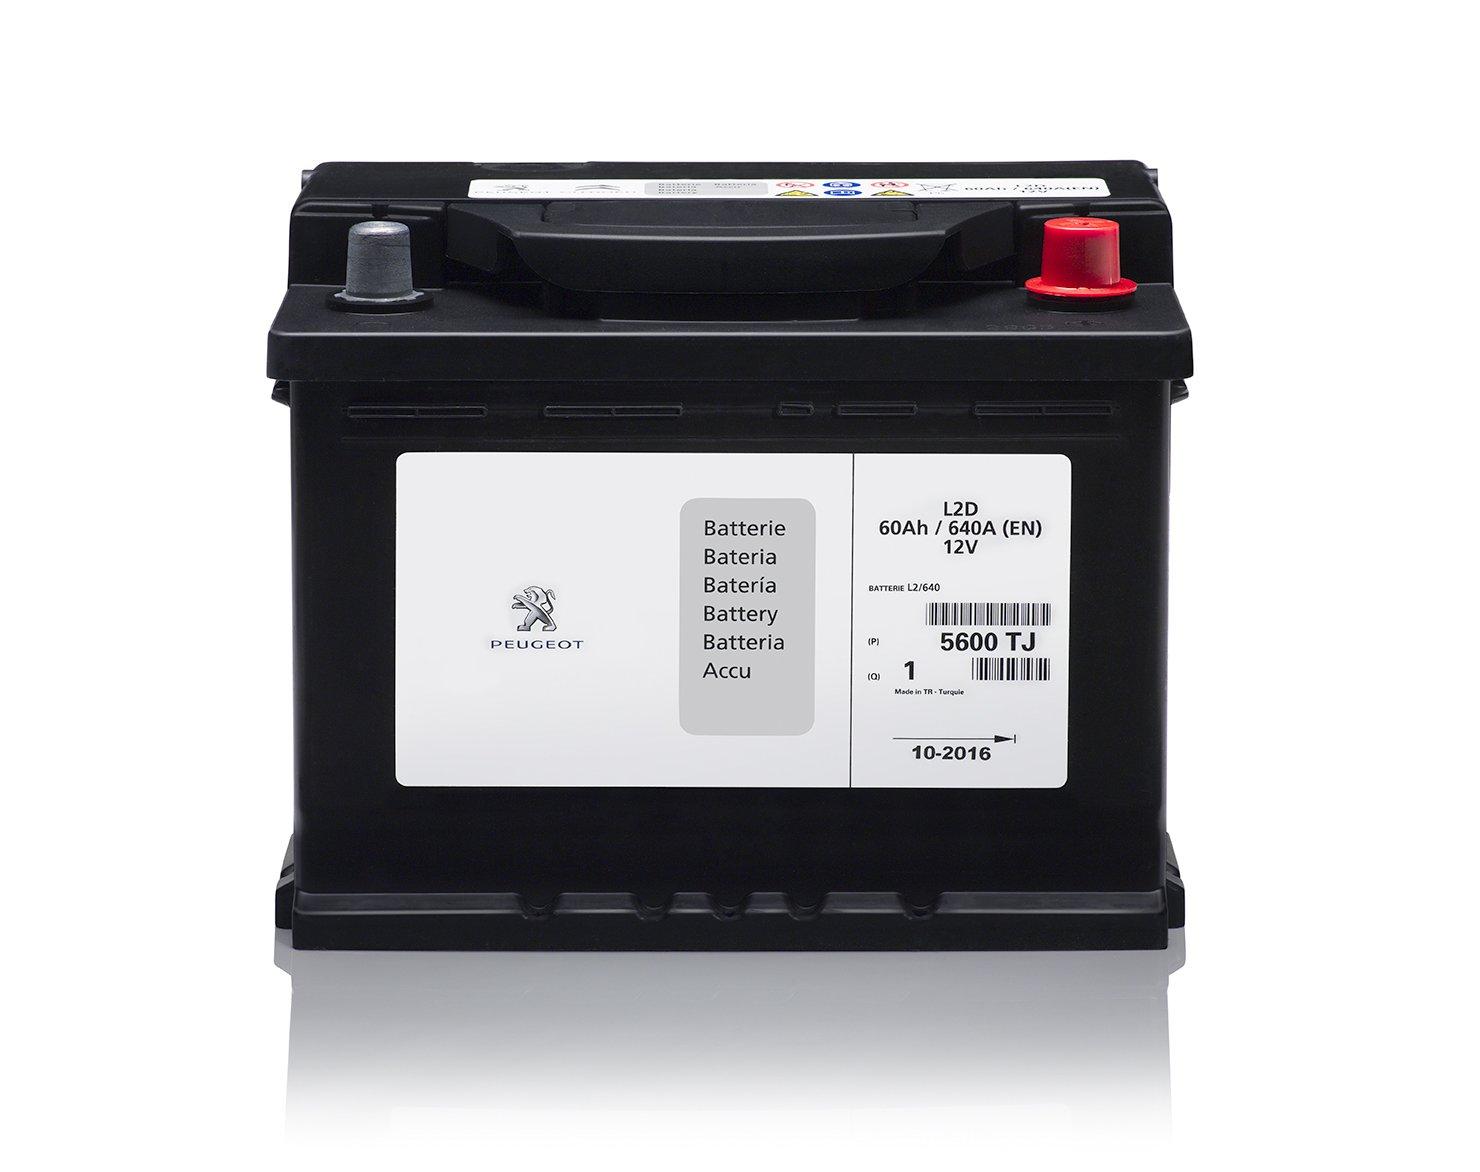 Аккумулятор Citroen/Peugeot (Eurorepar) 5600TJ, арт. 5600TJ